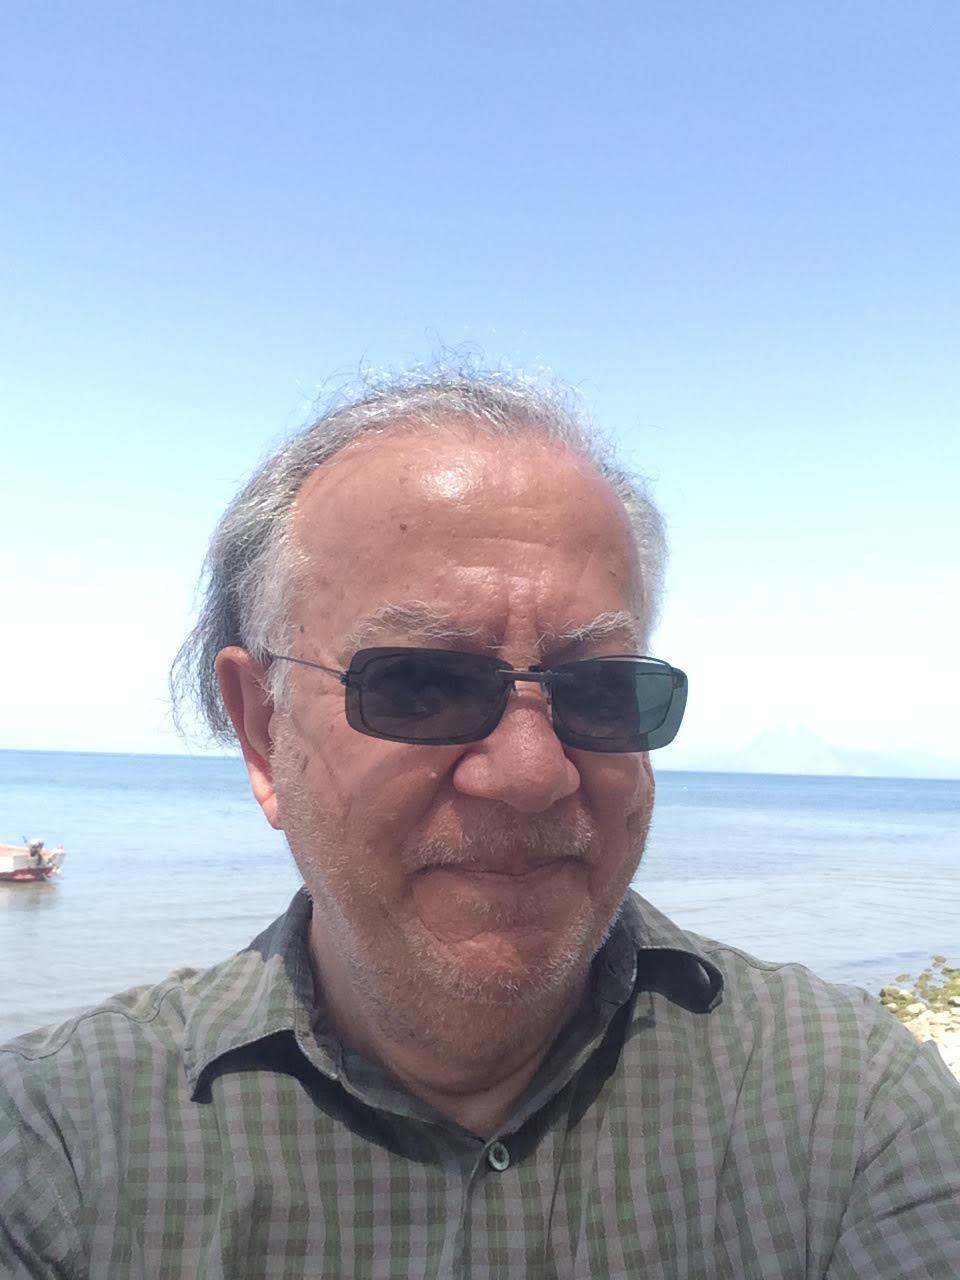 Moses Boudourides